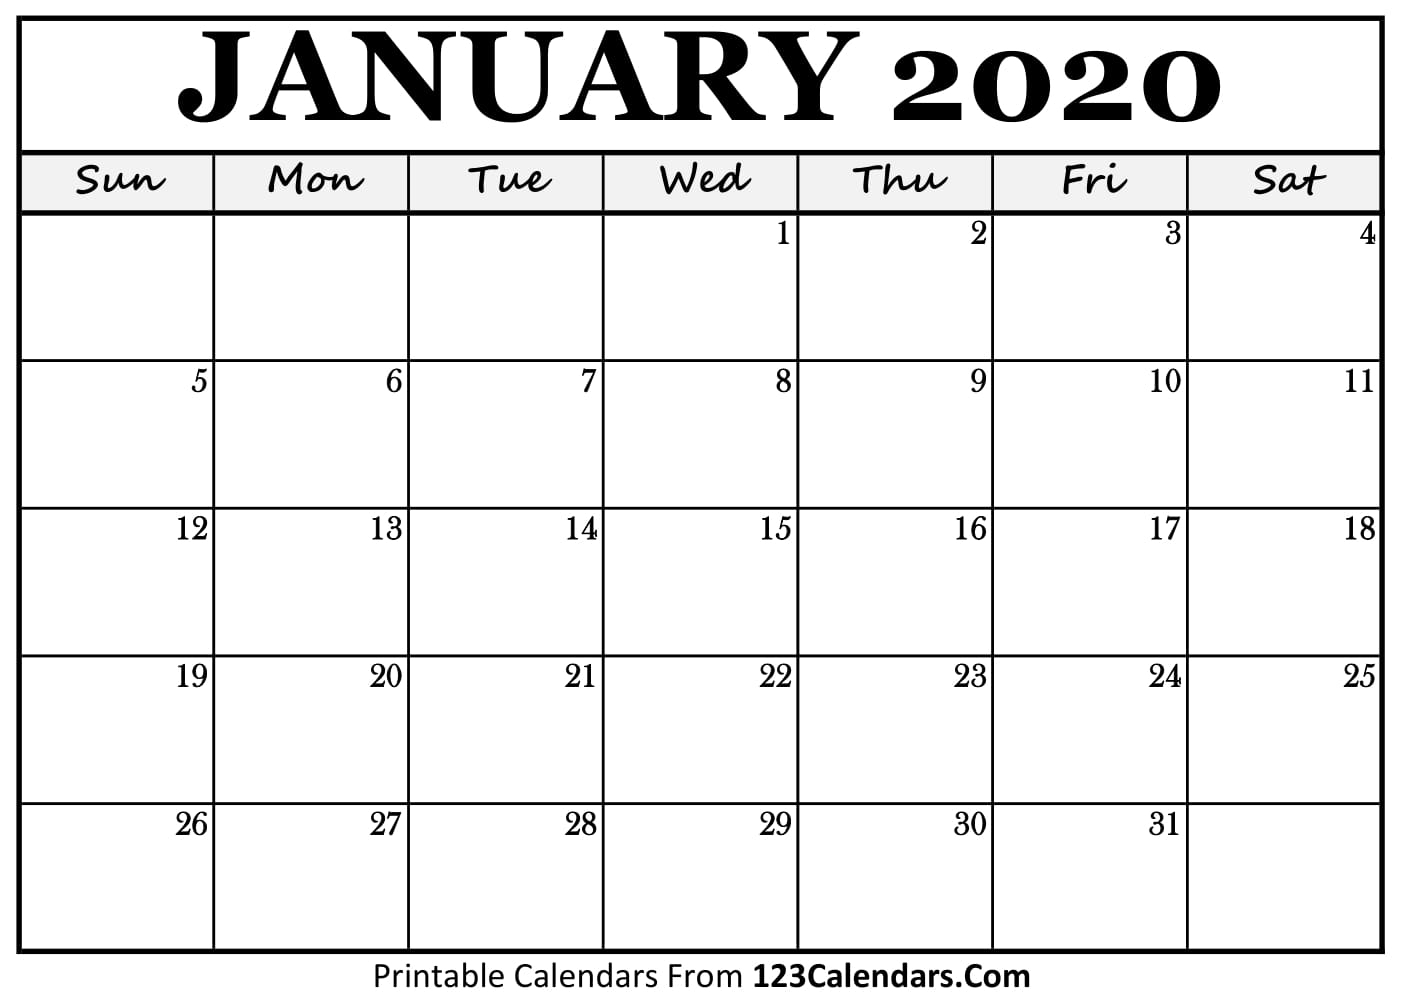 Free Printable Calendar | 123Calendars for September Thru December 2020 Calendar